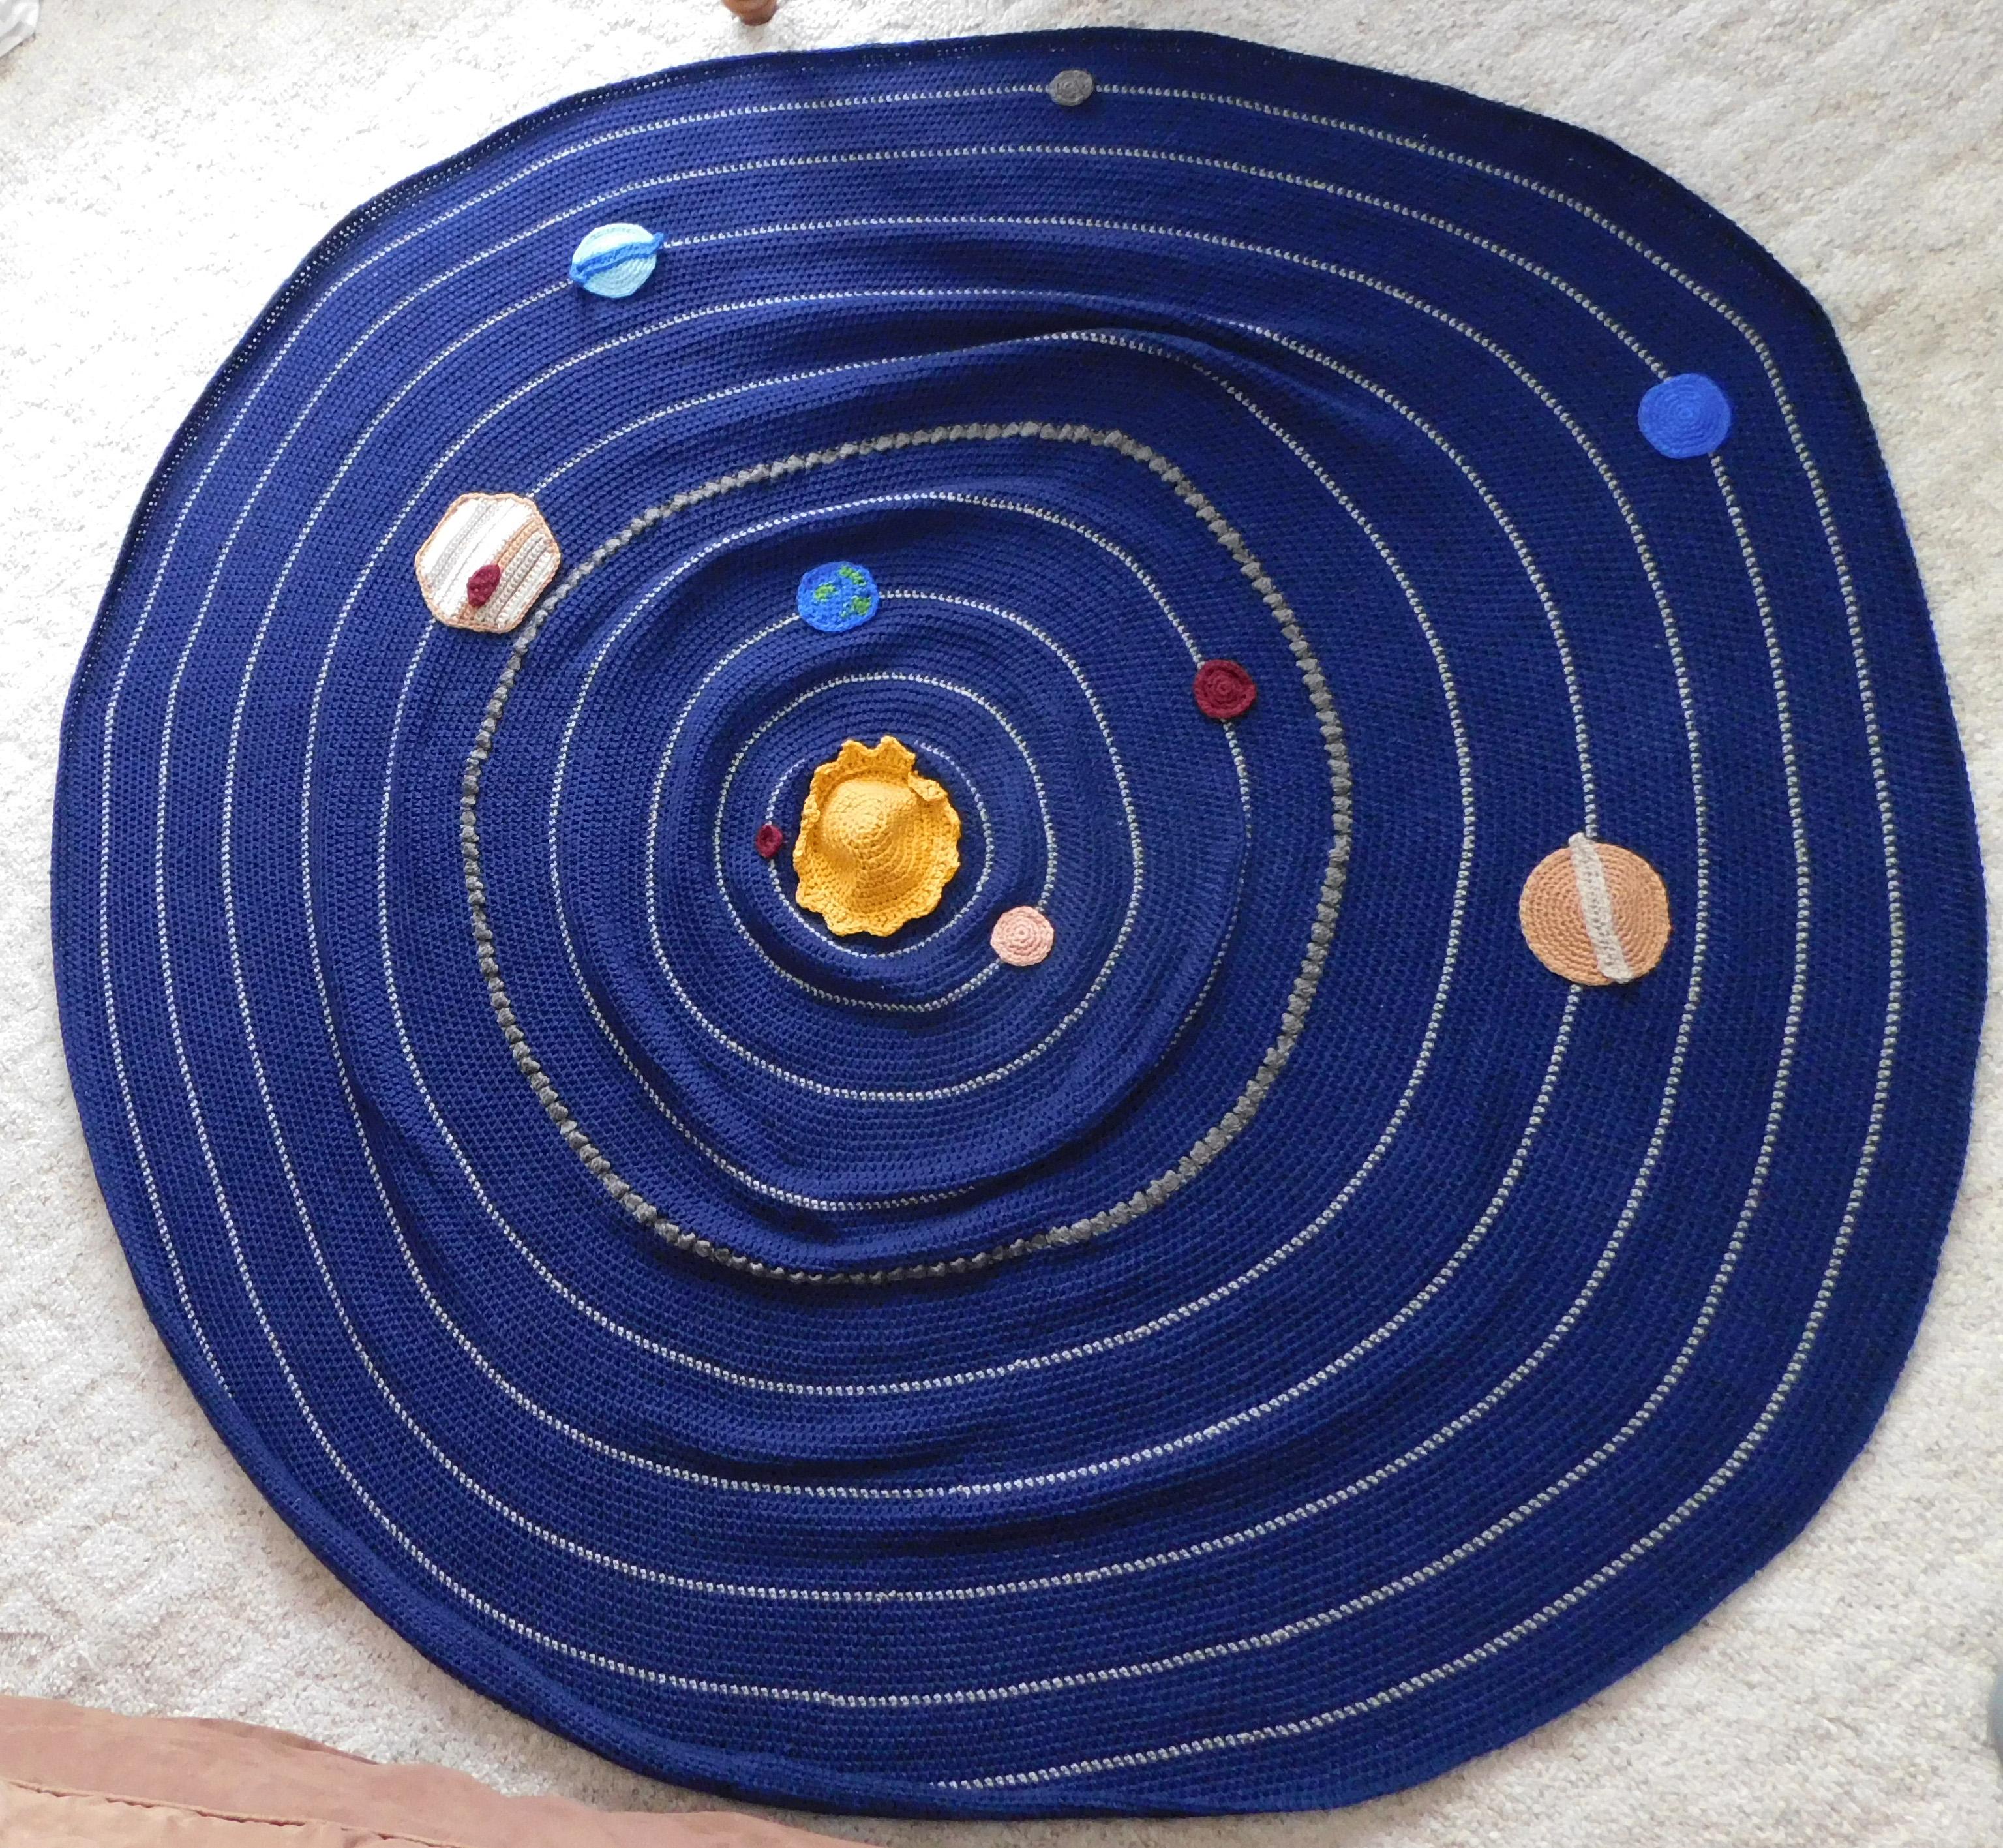 Solar System Blanket 01 2021